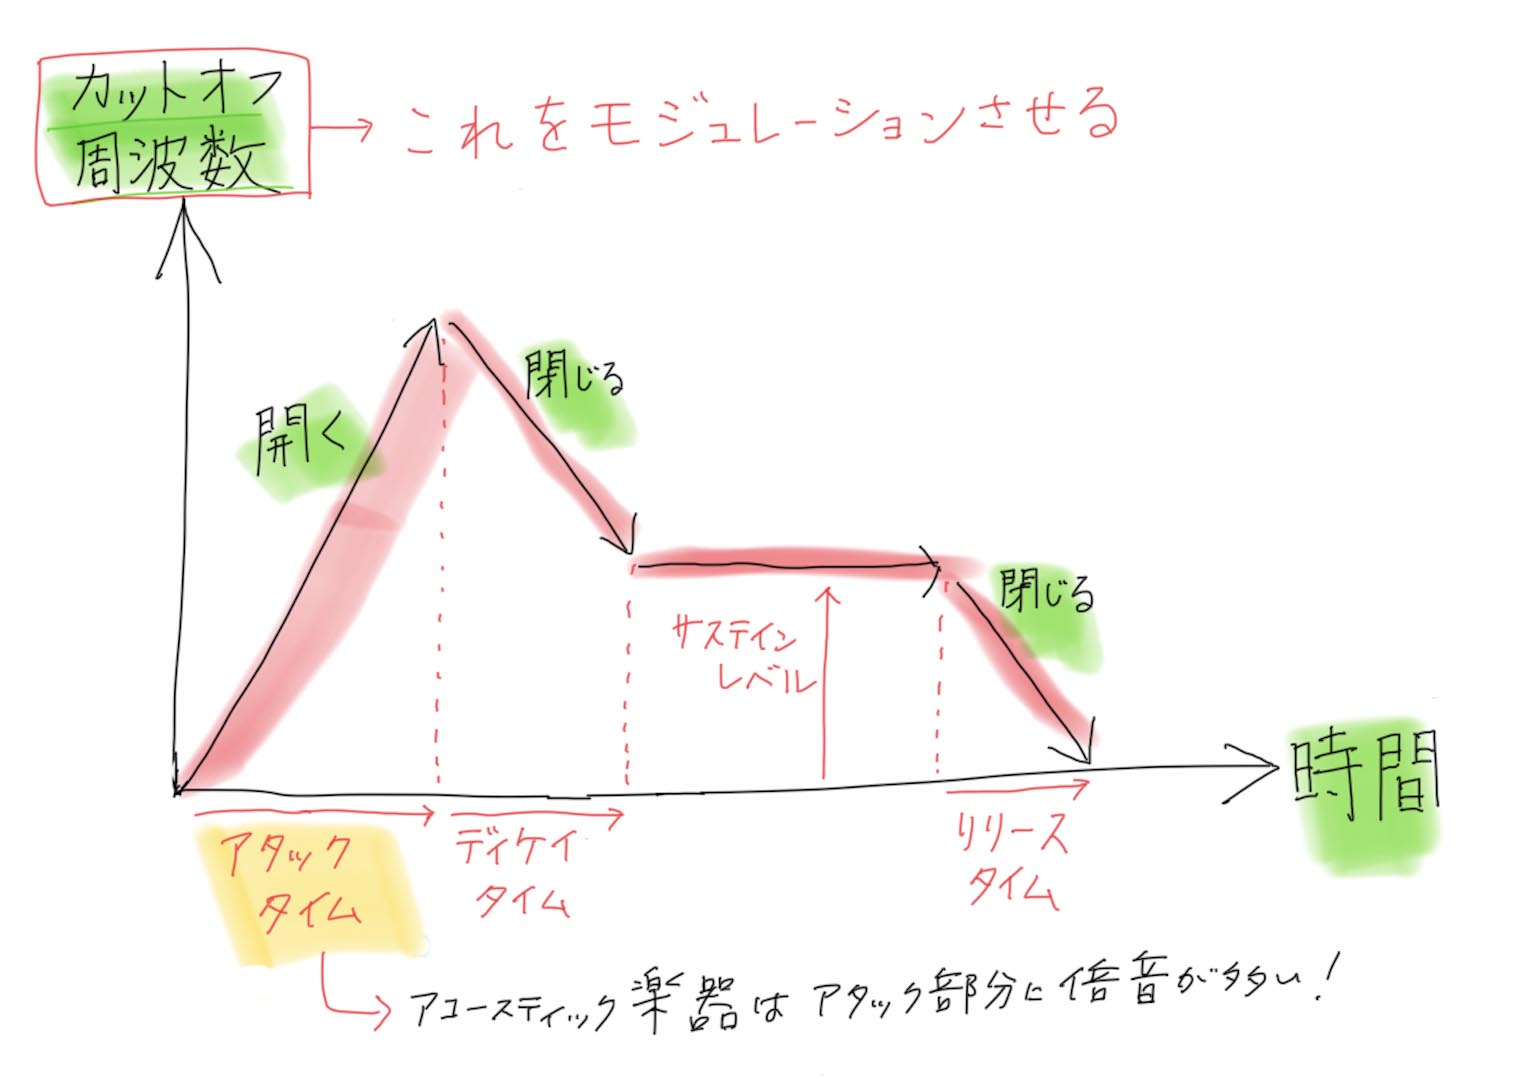 %e3%82%b9%e3%82%af%e3%83%aa%e3%83%bc%e3%83%b3%e3%82%b7%e3%83%a7%e3%83%83%e3%83%88-2016-09-23-14-59-12%e3%81%ae%e3%82%b3%e3%83%94%e3%83%bc